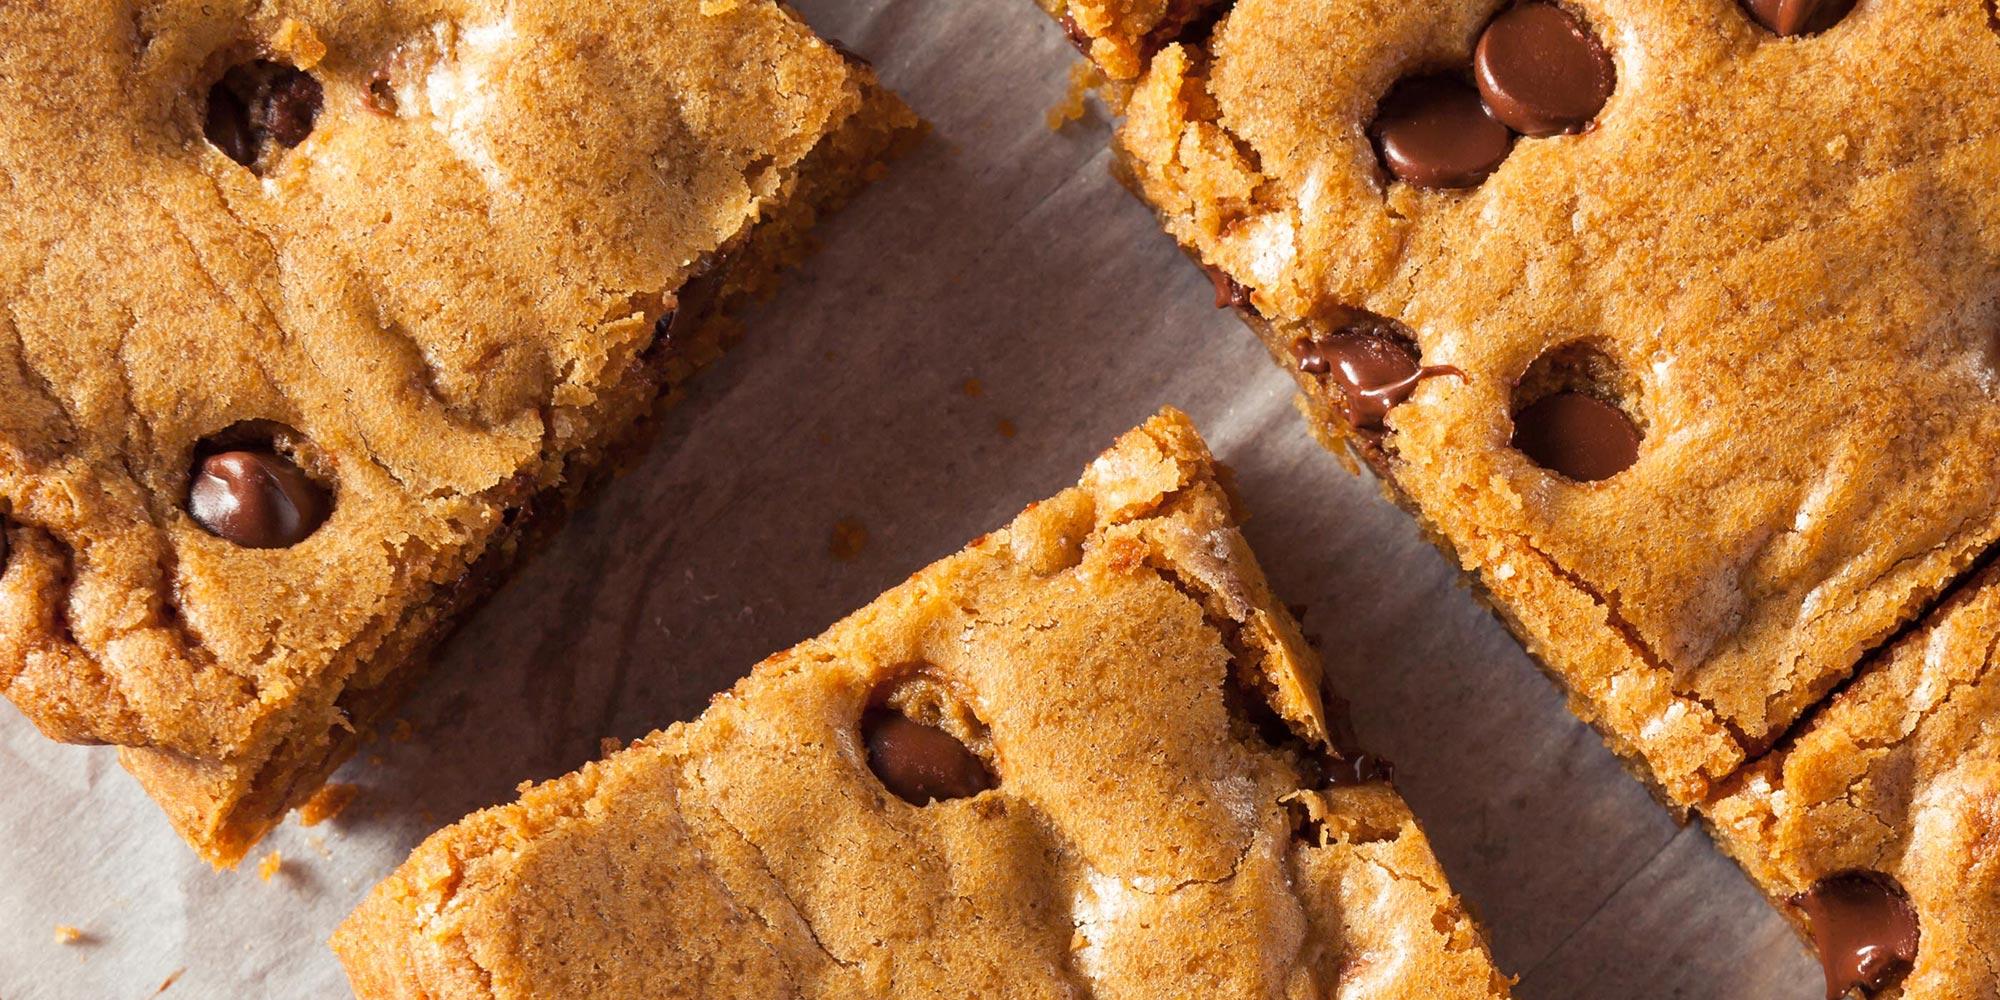 Chocolate Peanut Butter Triangles Recipe No Calorie Sweetener Sugar Substitute Splenda Sweeteners